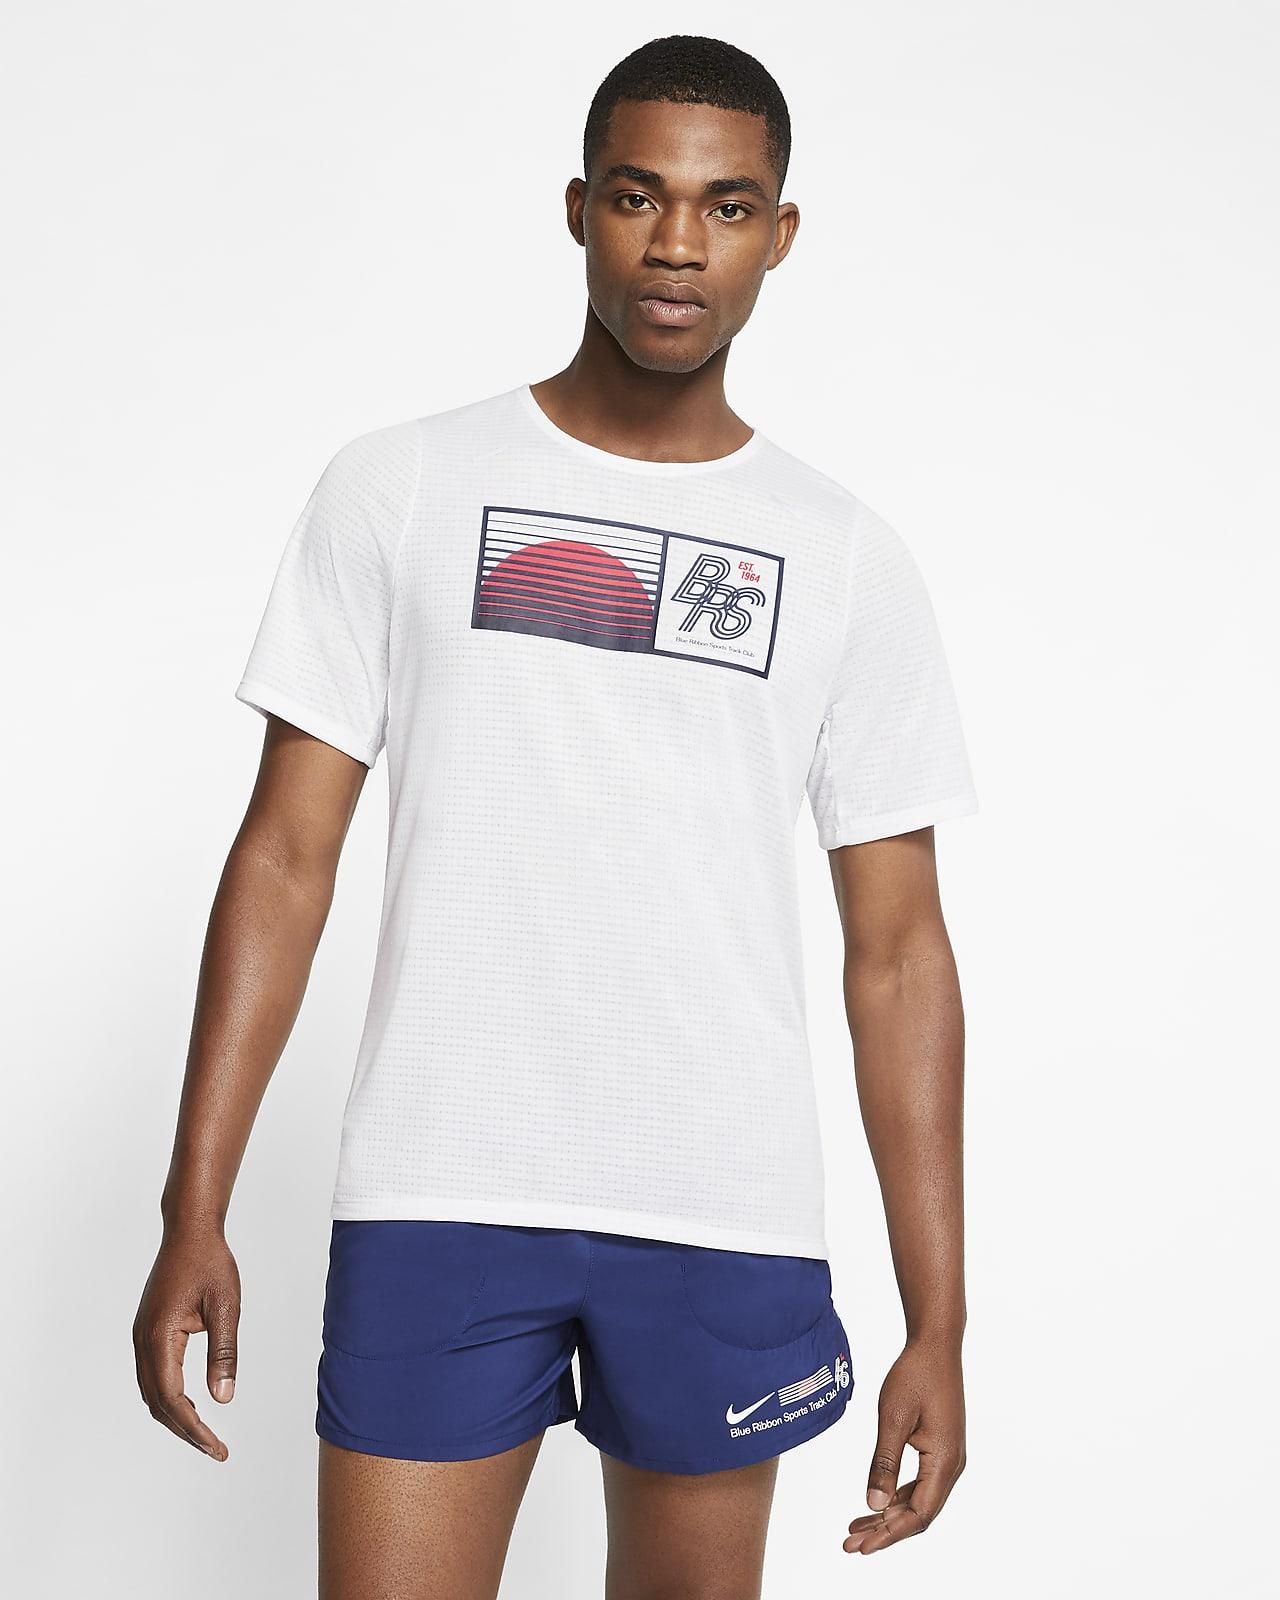 Camisola de running Nike Rise 365 Blue Ribbon Sports para homem